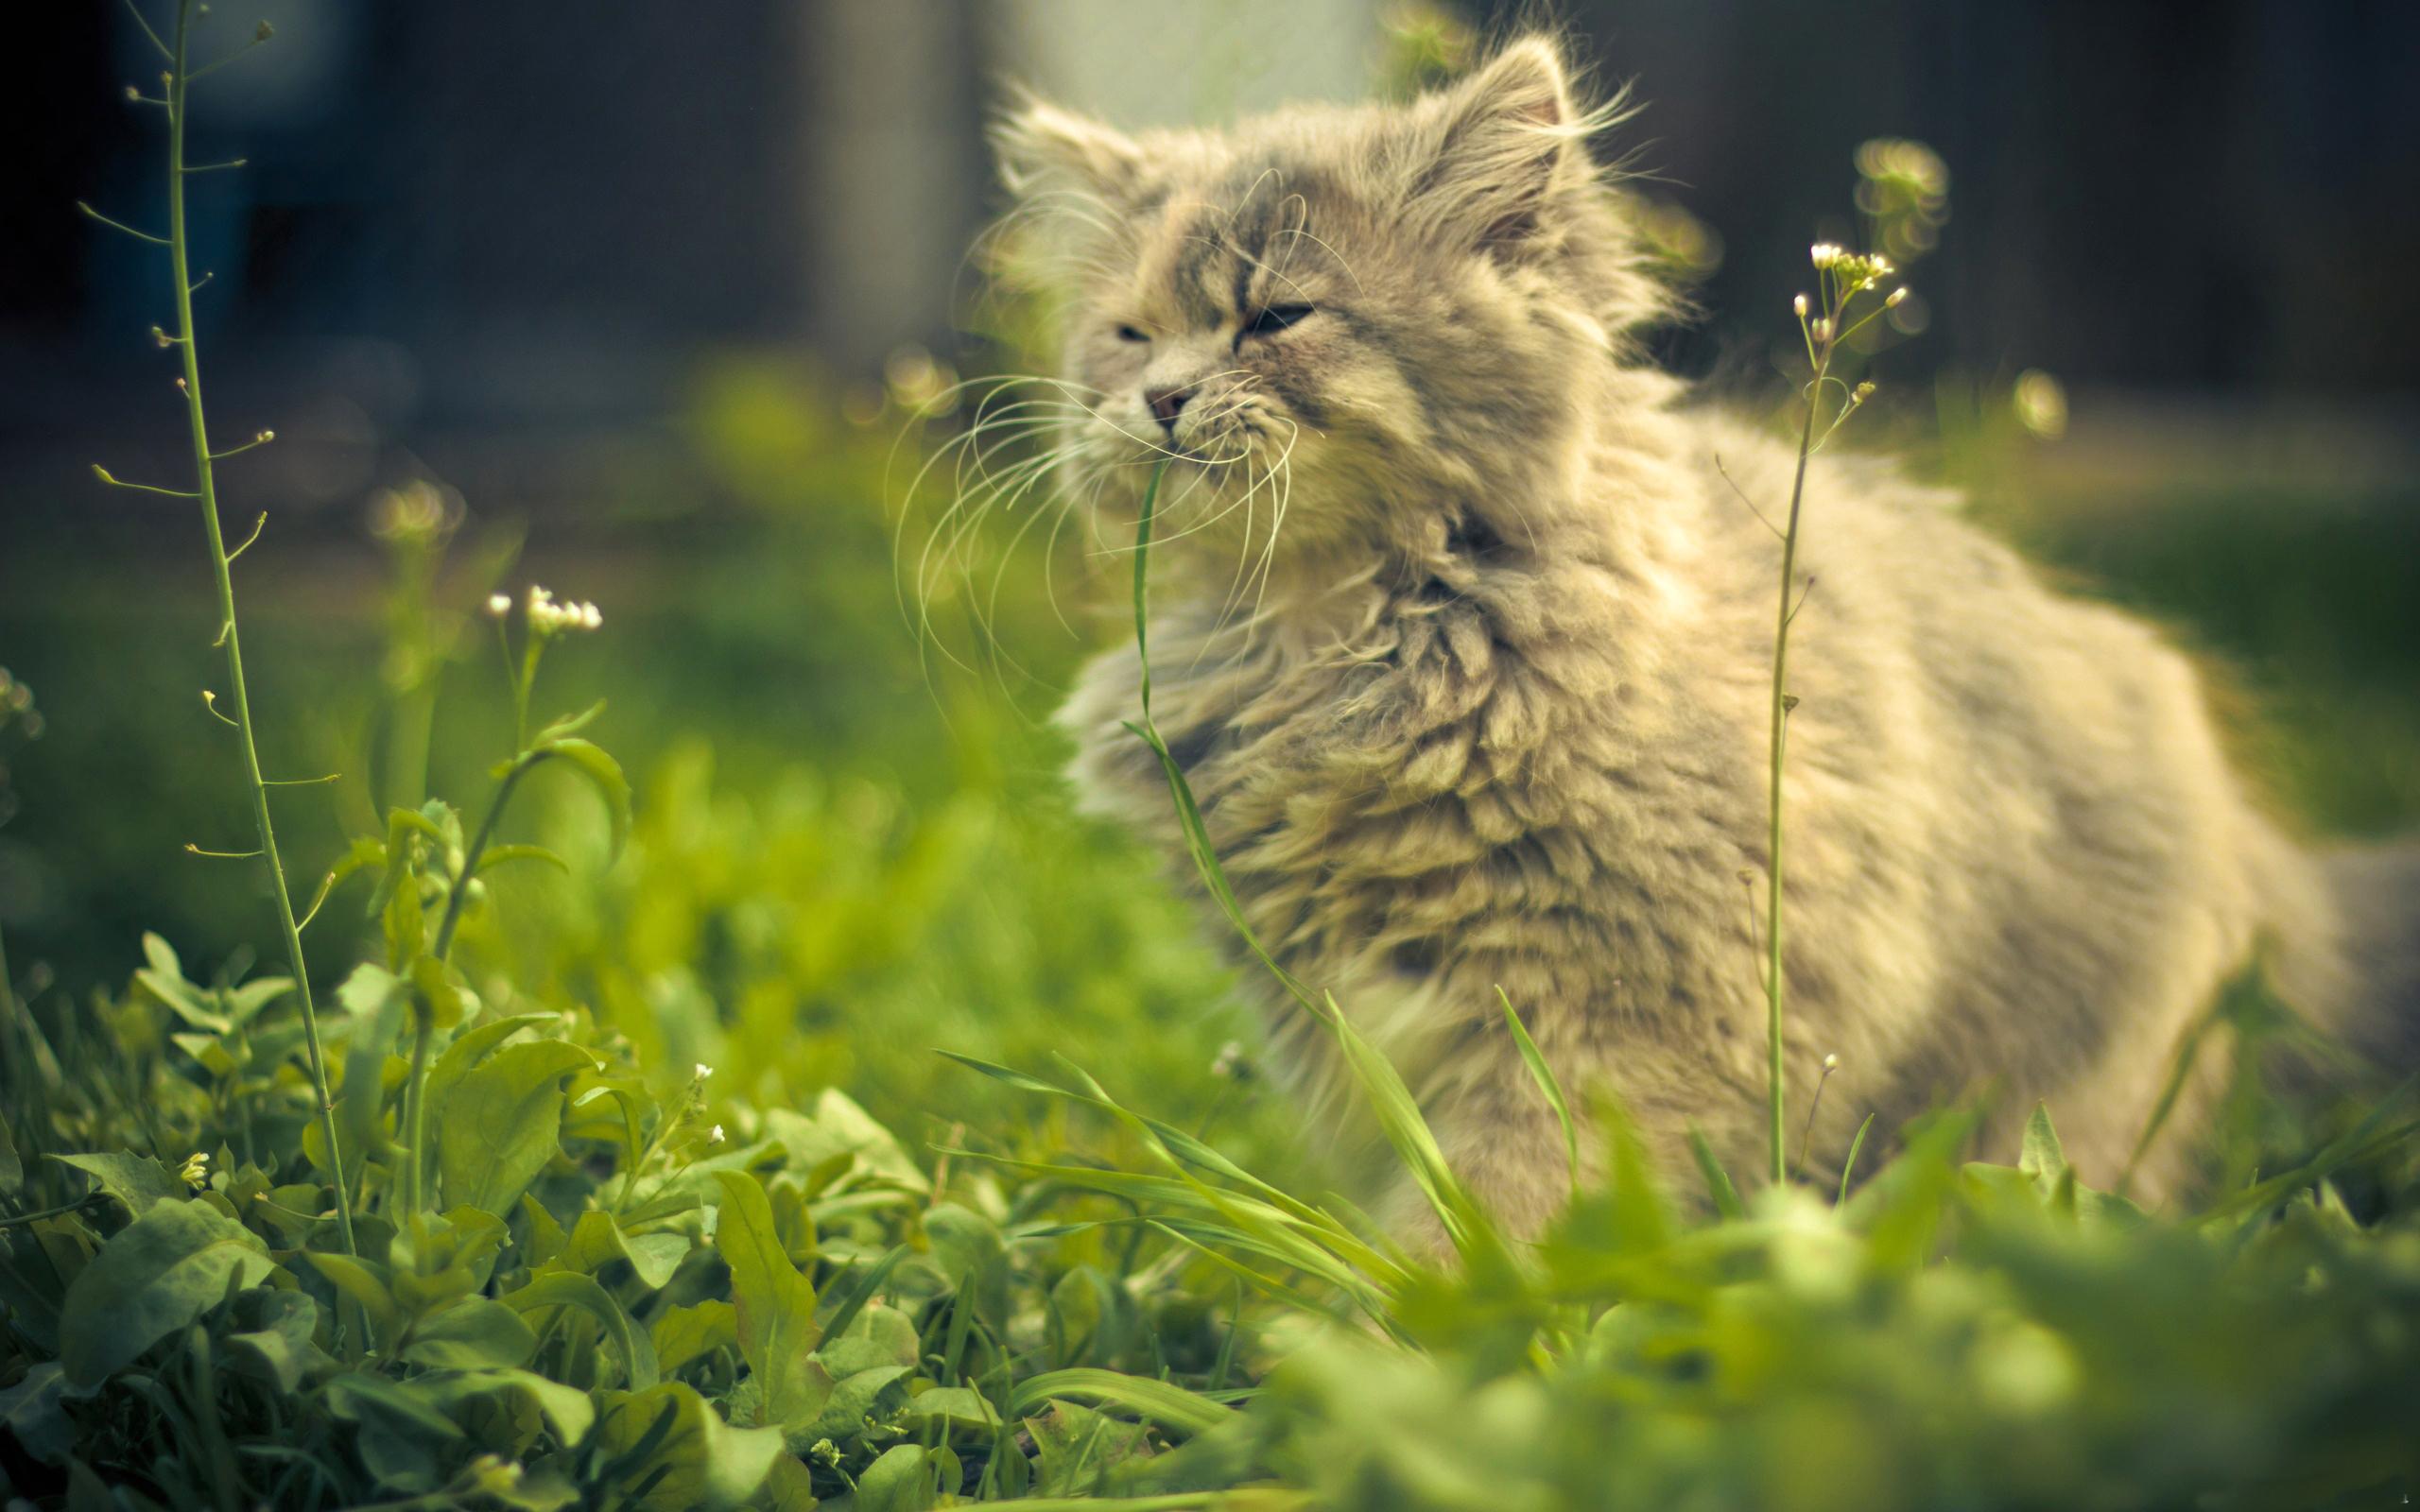 природа животные трава кот  № 1316900 бесплатно